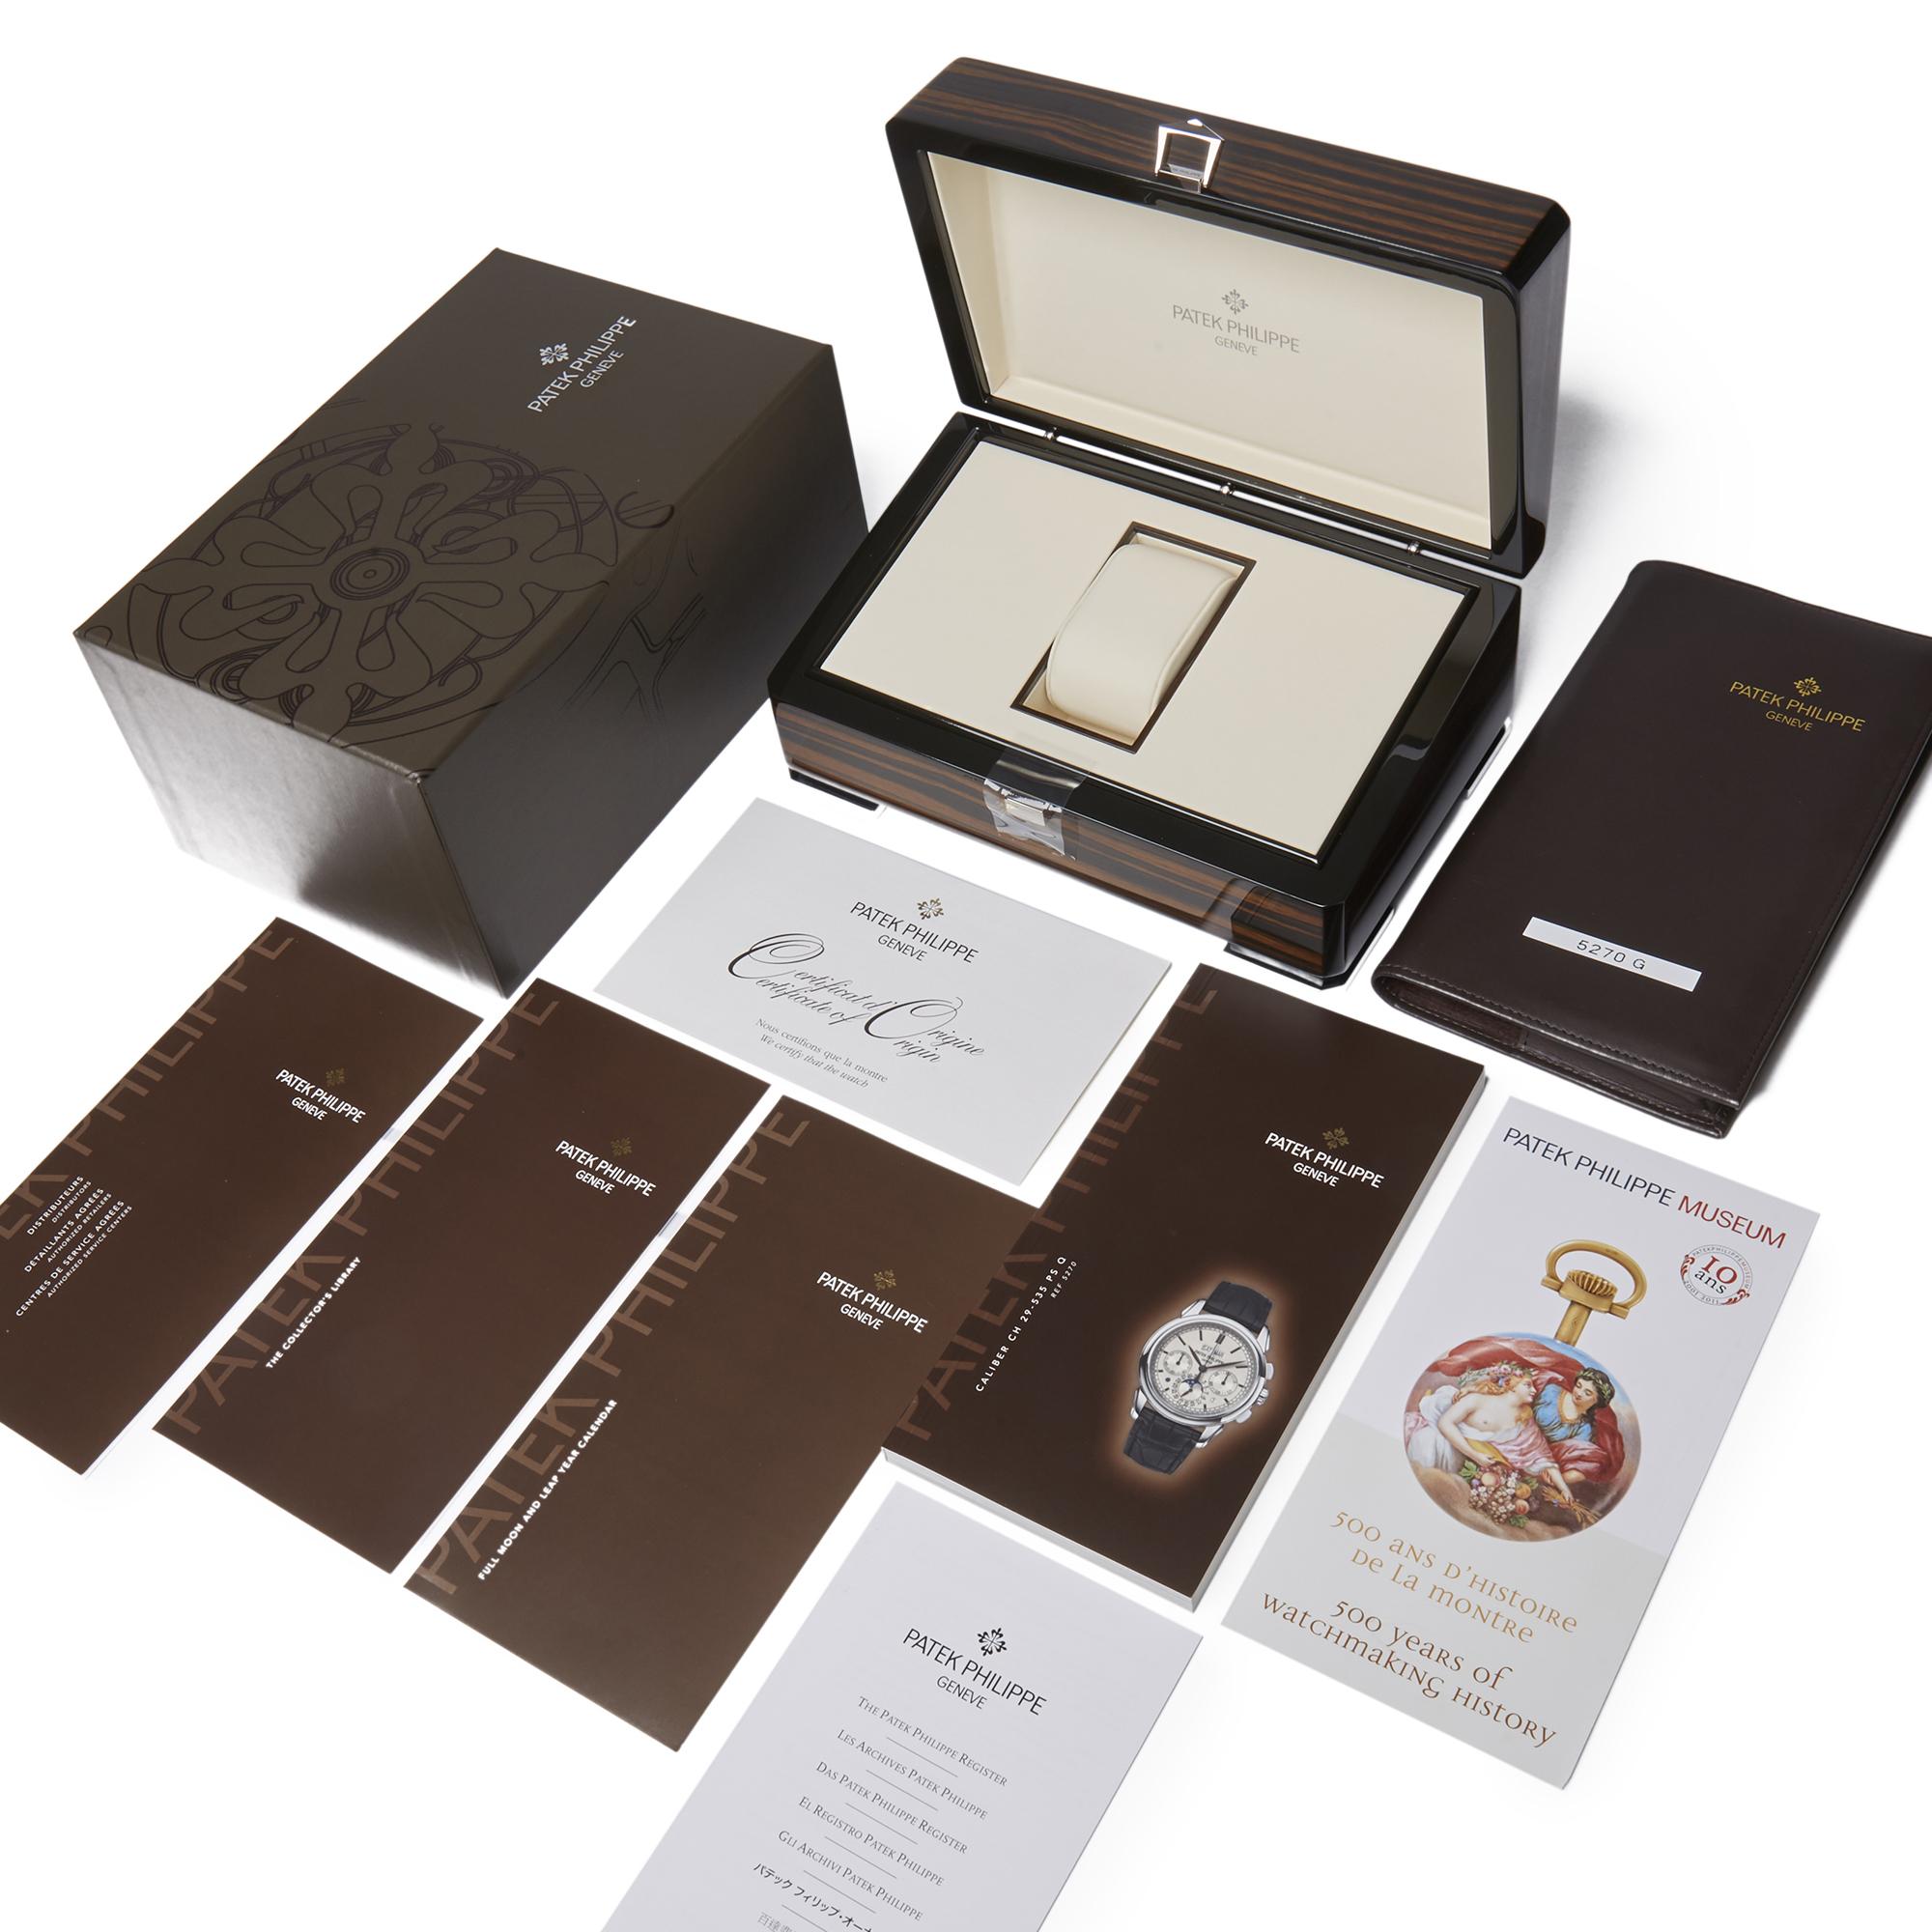 Lot 5 - Patek Philippe Perpetual Calendar Perpetual Calendar Chronograph 18k White Gold - 5270G-001